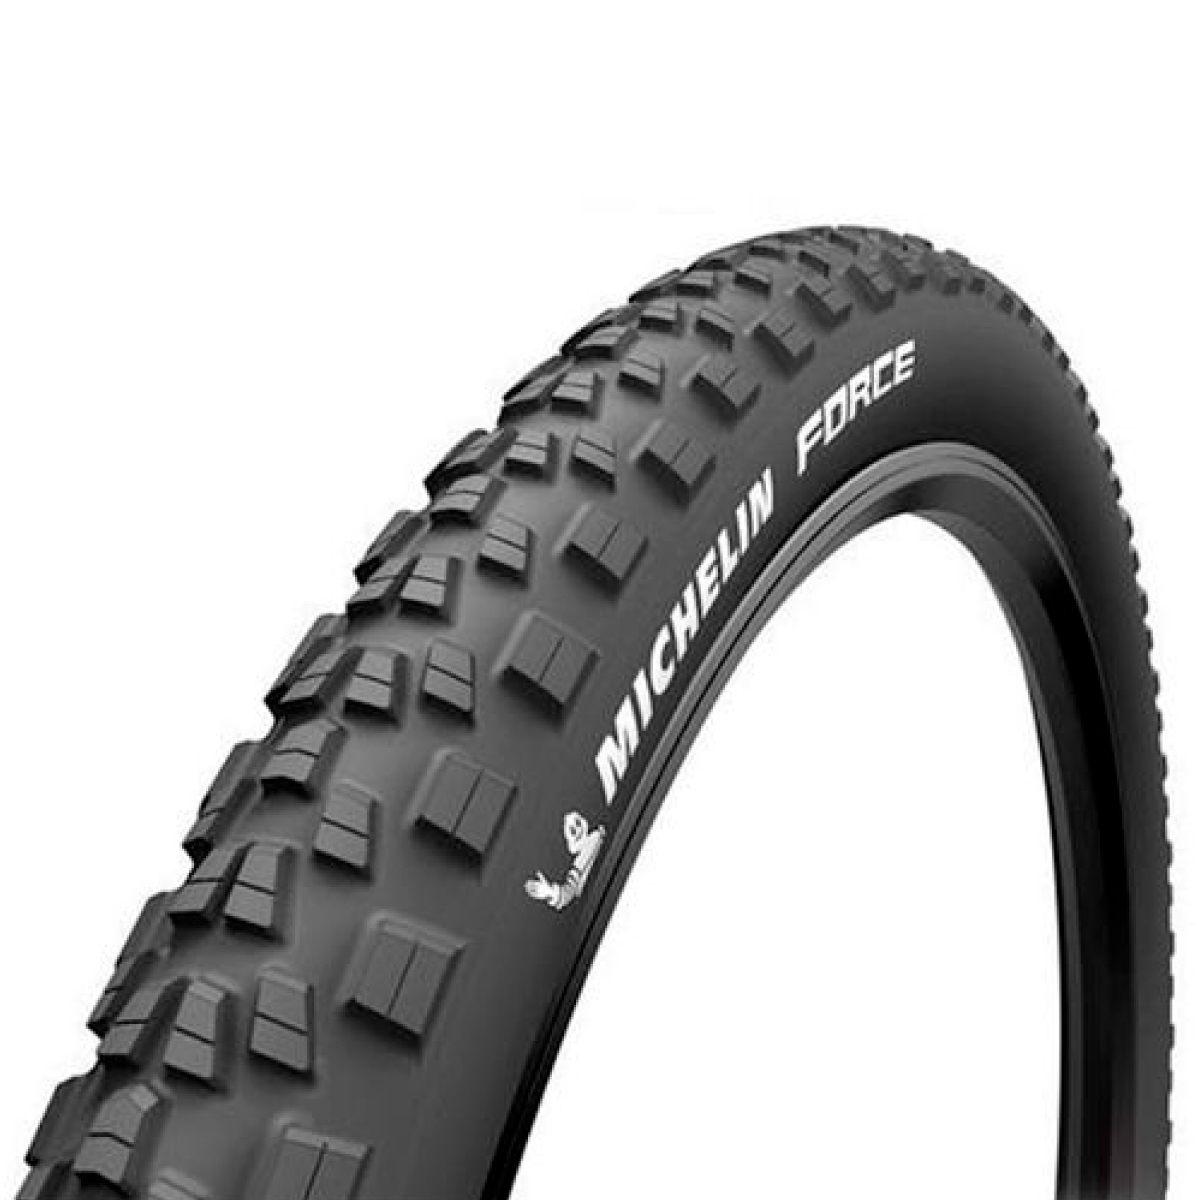 Pneu Michelin Force Access Line Talao Rigido 29x2.25